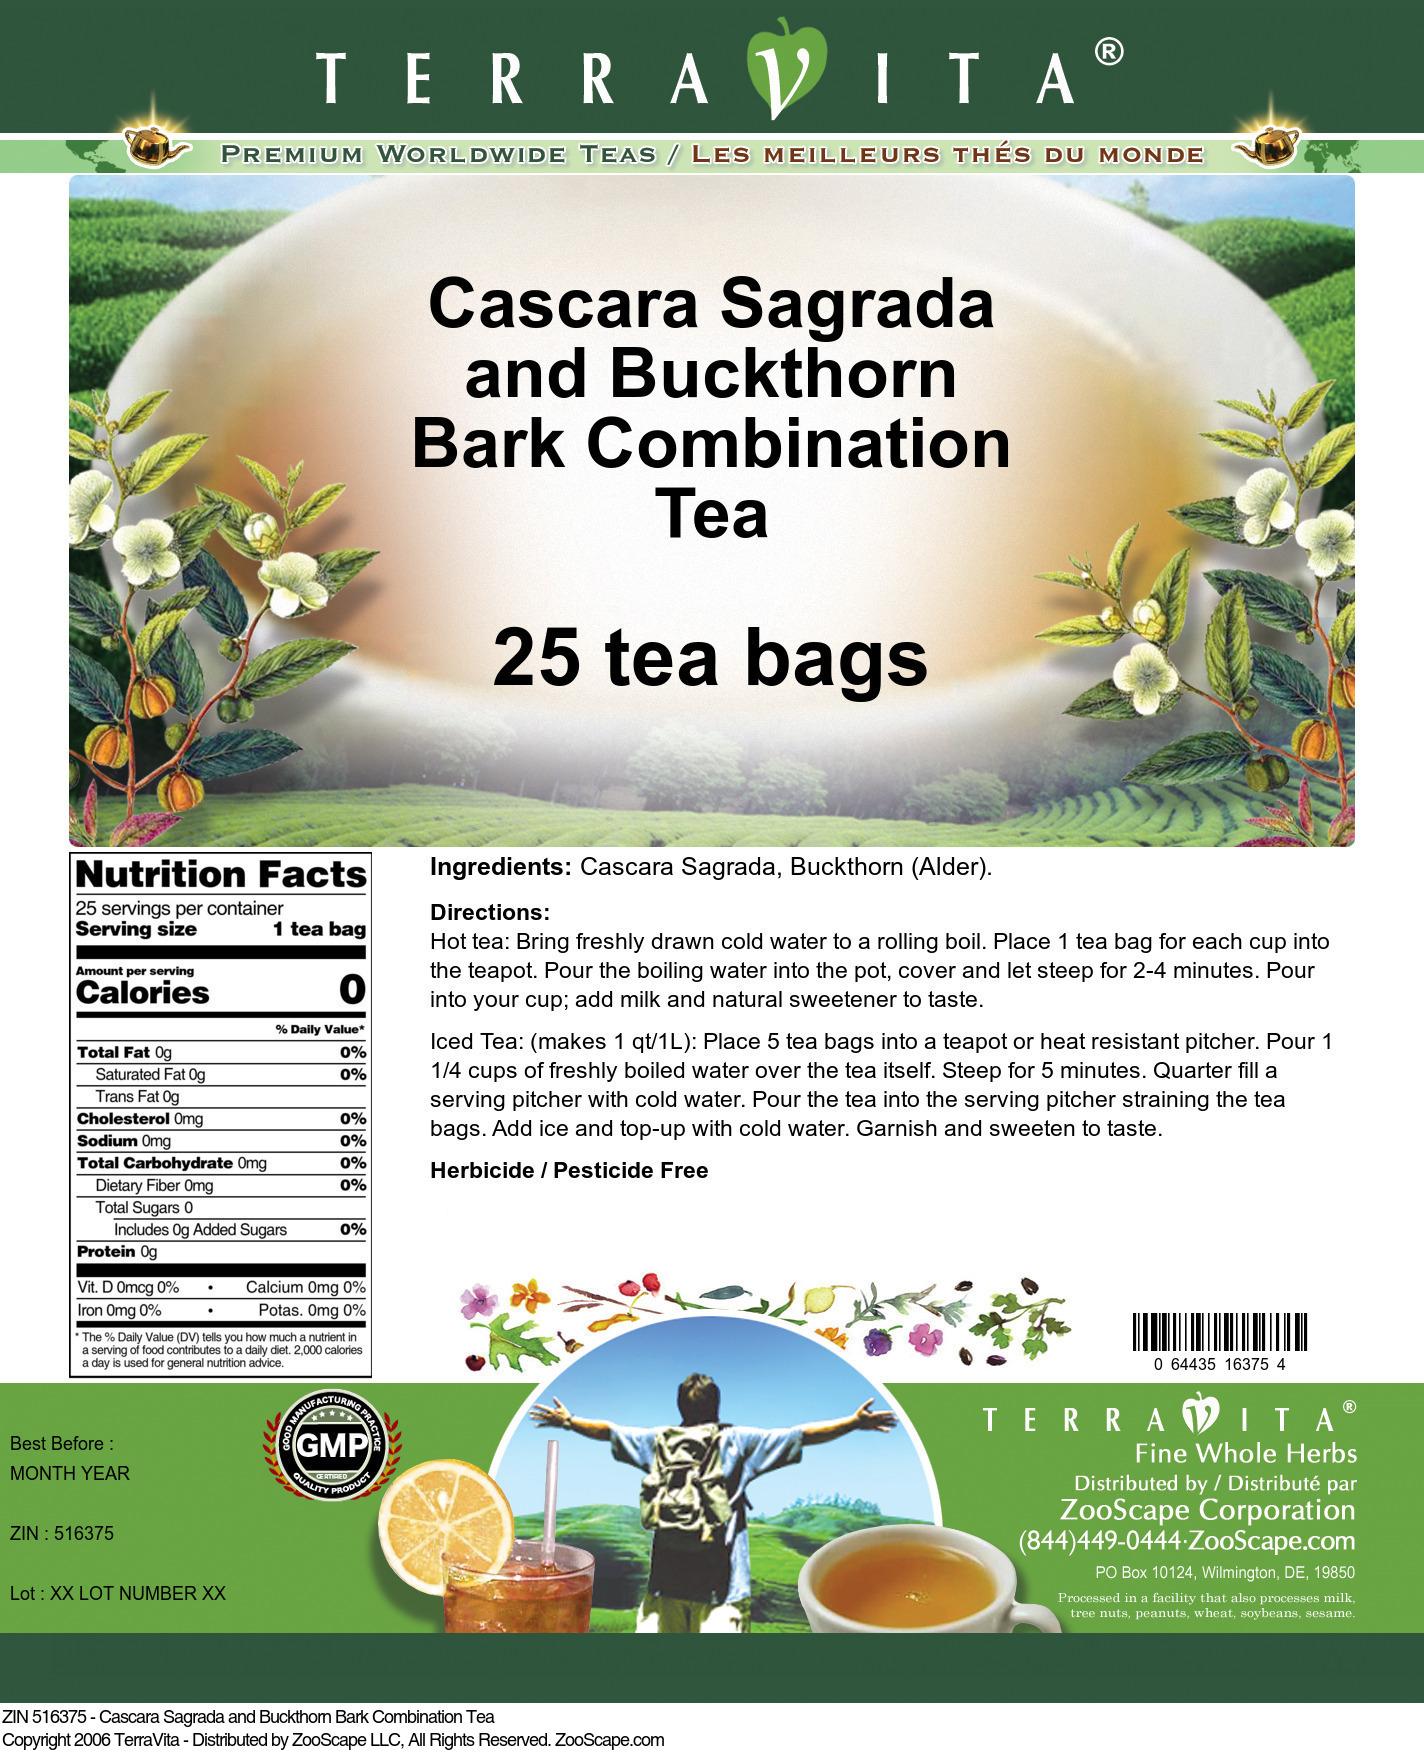 Cascara Sagrada and Buckthorn Bark Combination Tea